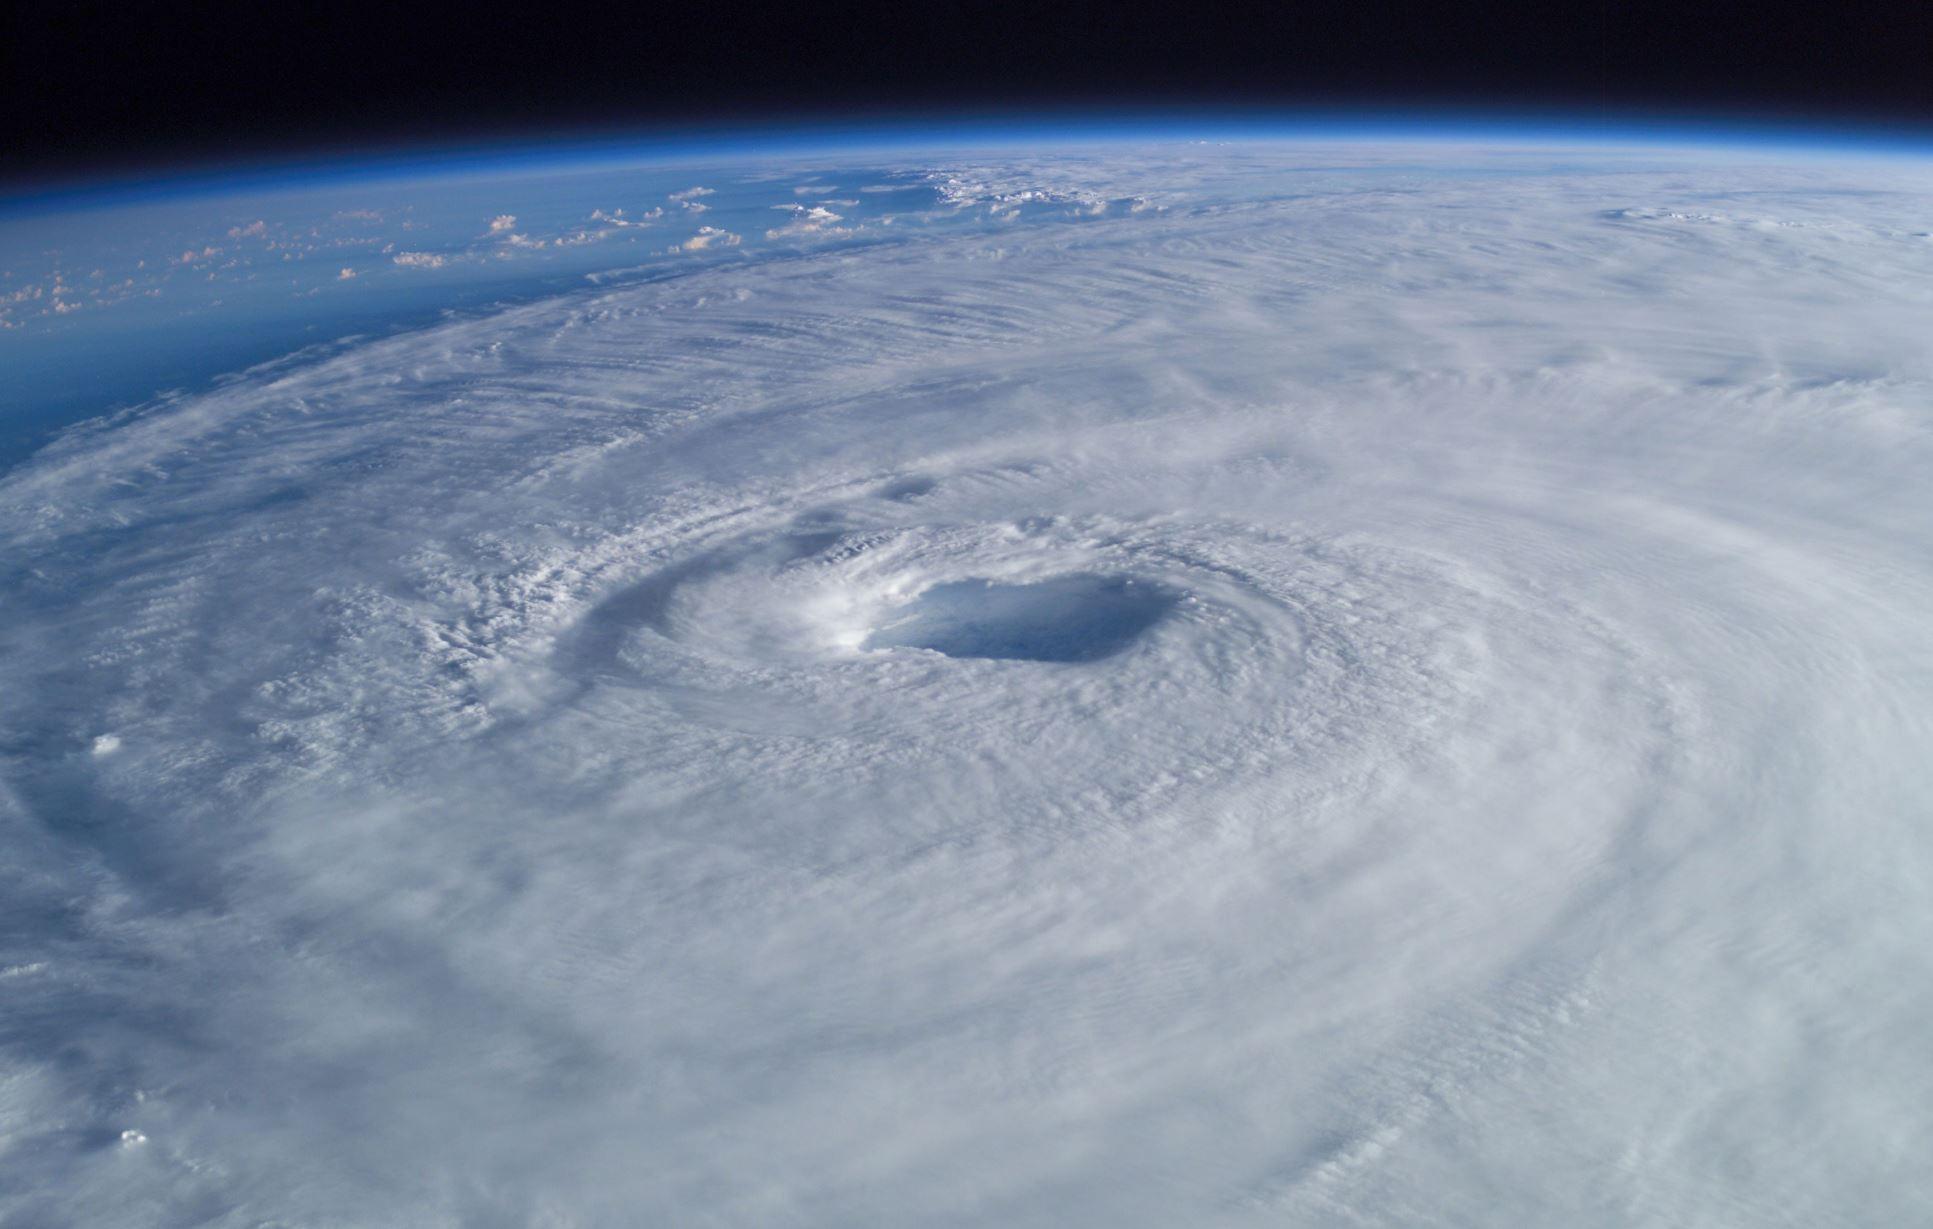 Image courtesy of Mike Trenchard, Earth Sciences & Image Analysis Laboratory, NASA Johnson Space Center via  Wikimedia Commons